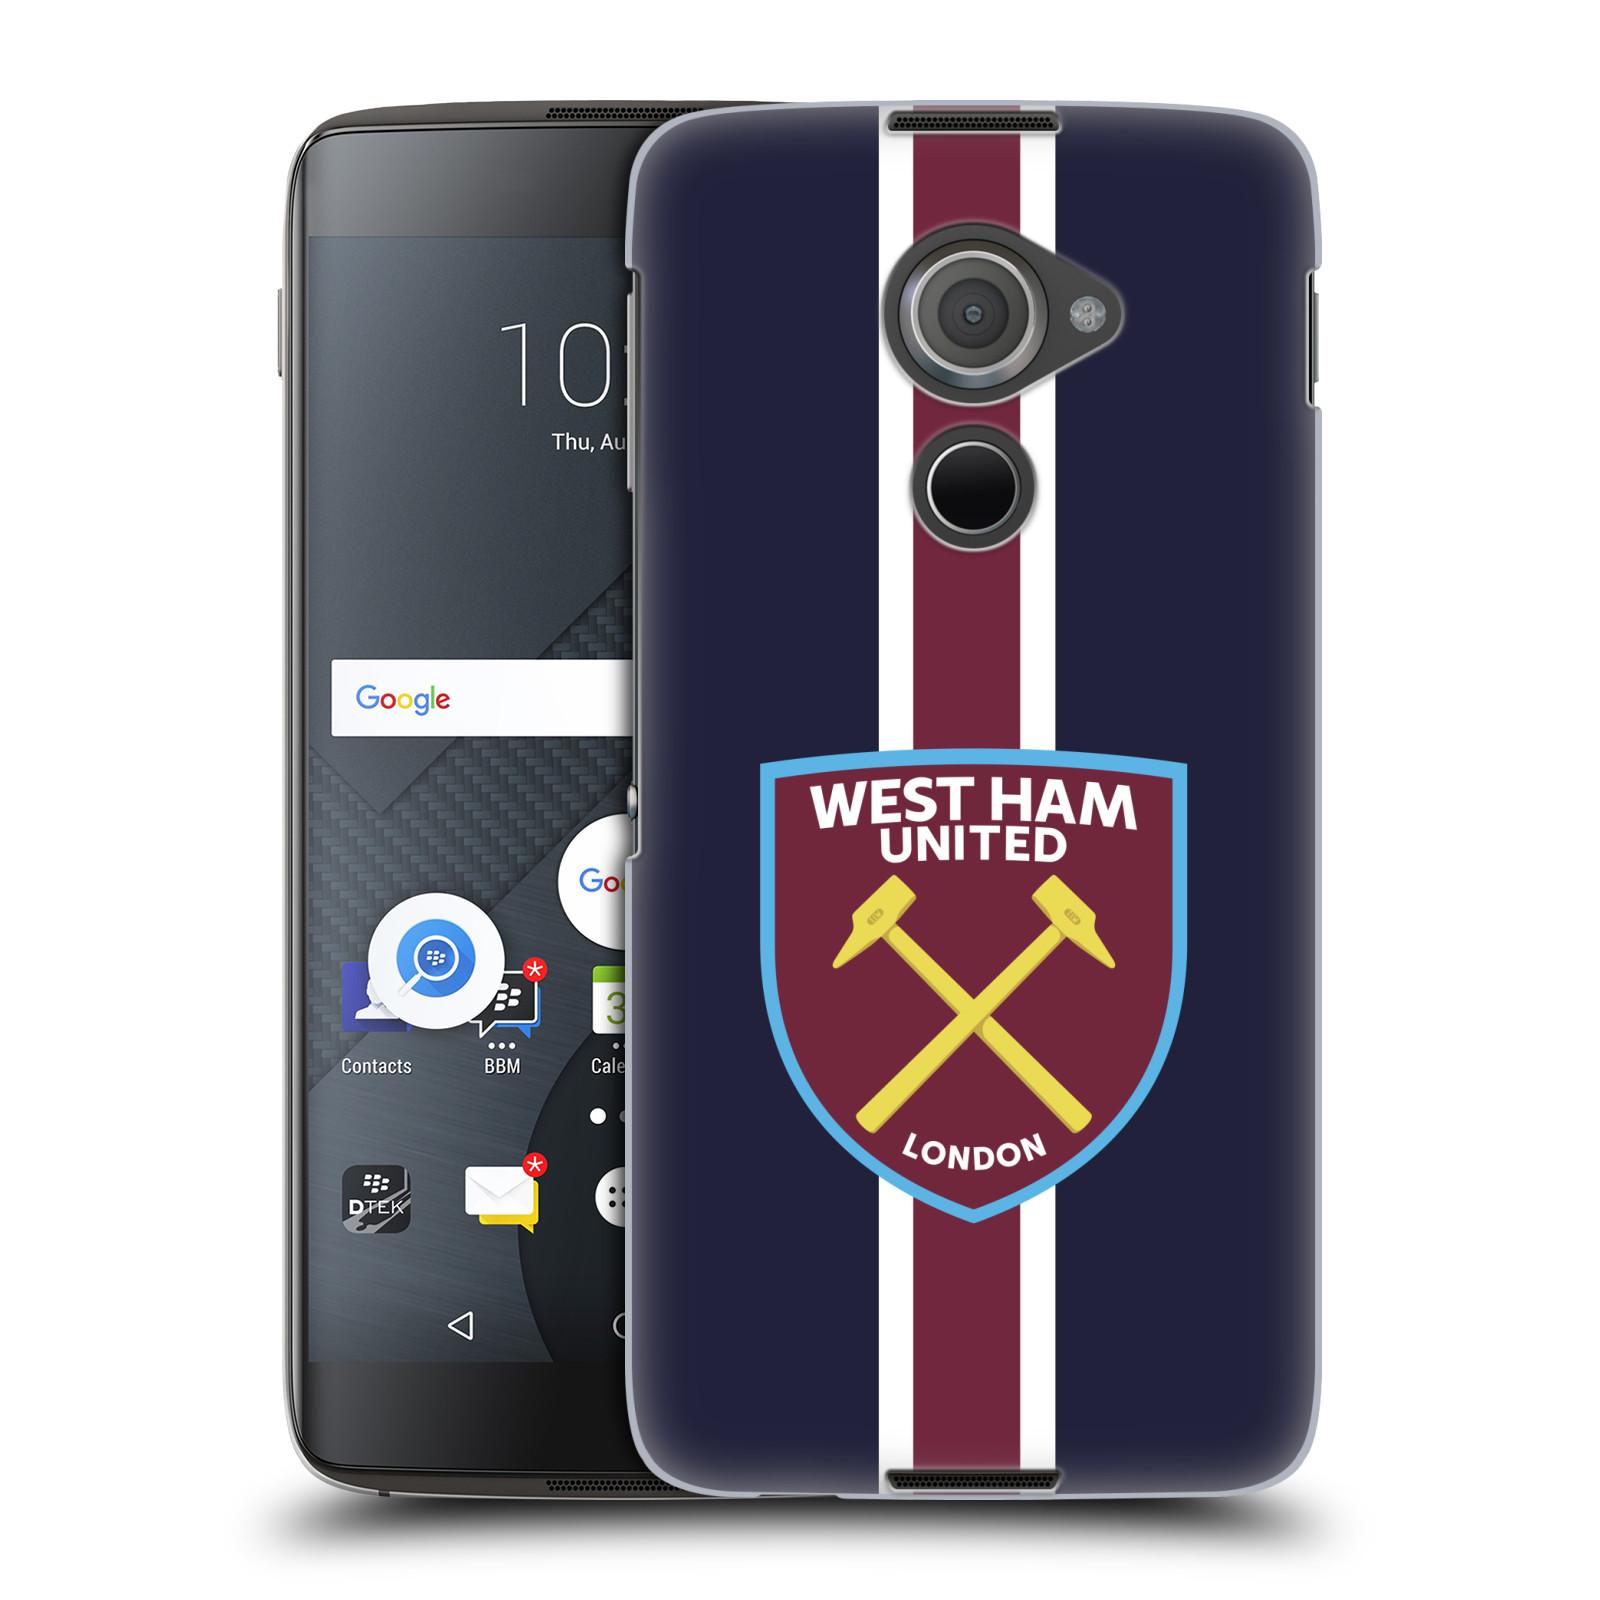 Plastové pouzdro na mobil Blackberry DTEK60 (Argon) - Head Case - West Ham United - Pruhy